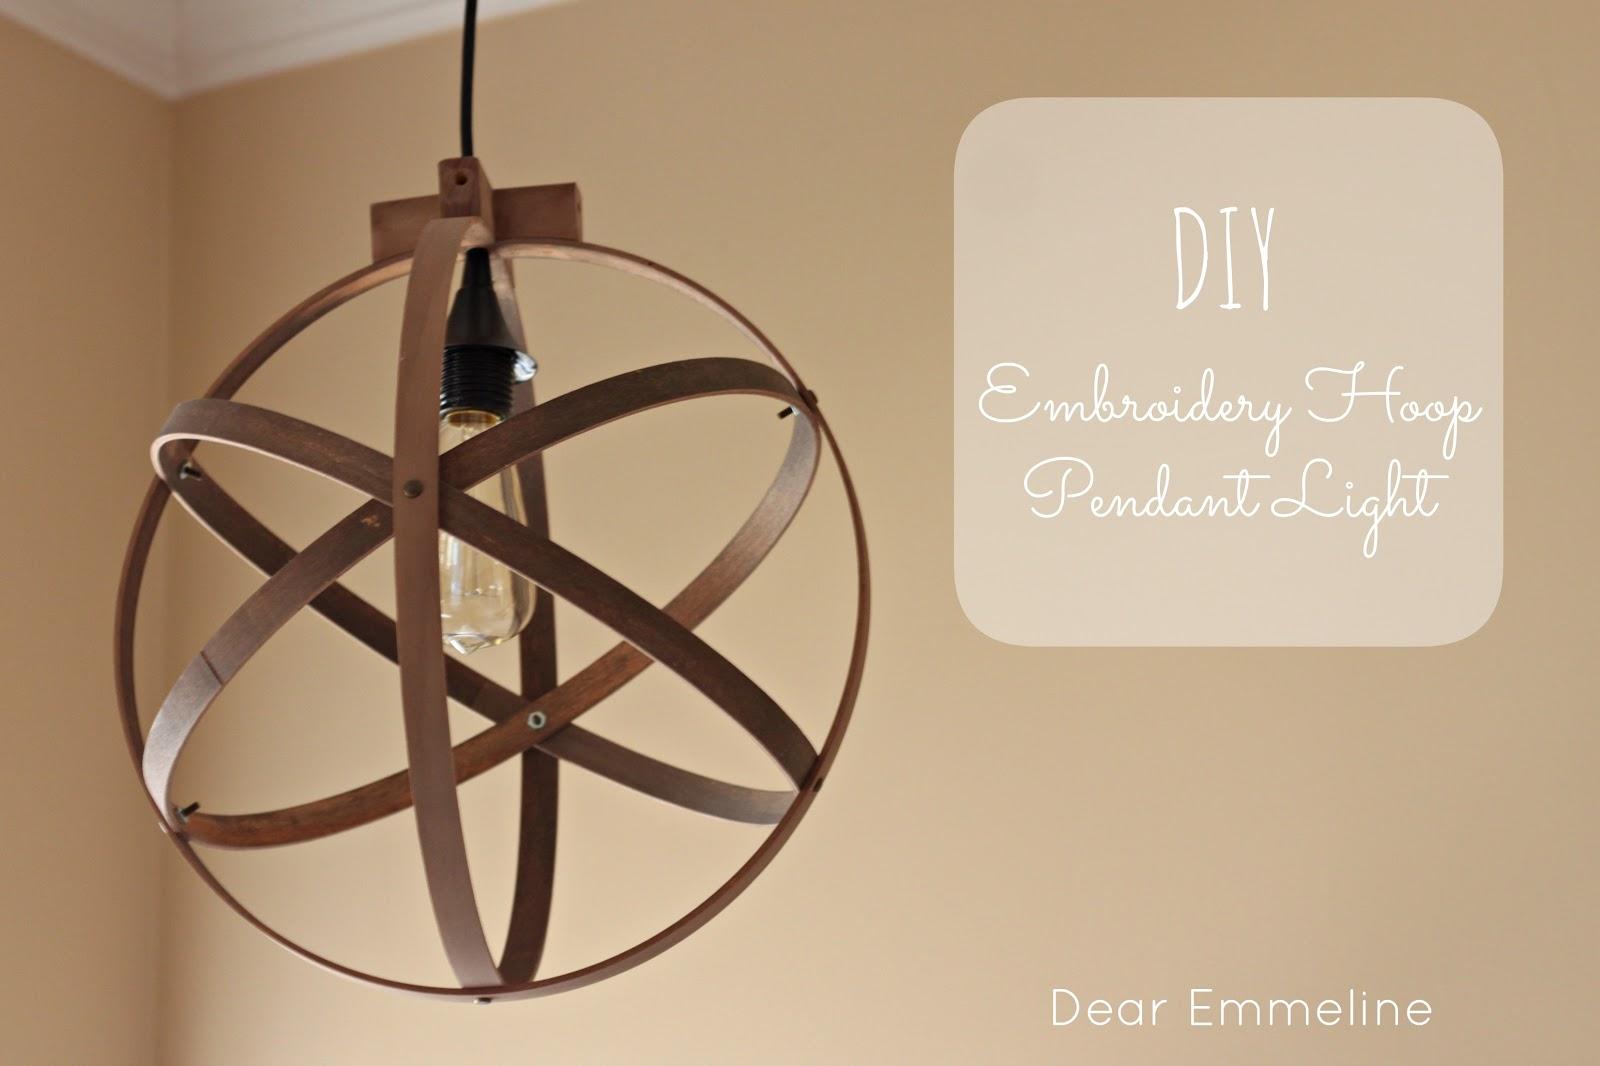 Diy easy embroidery hoop pendant aloadofball Image collections